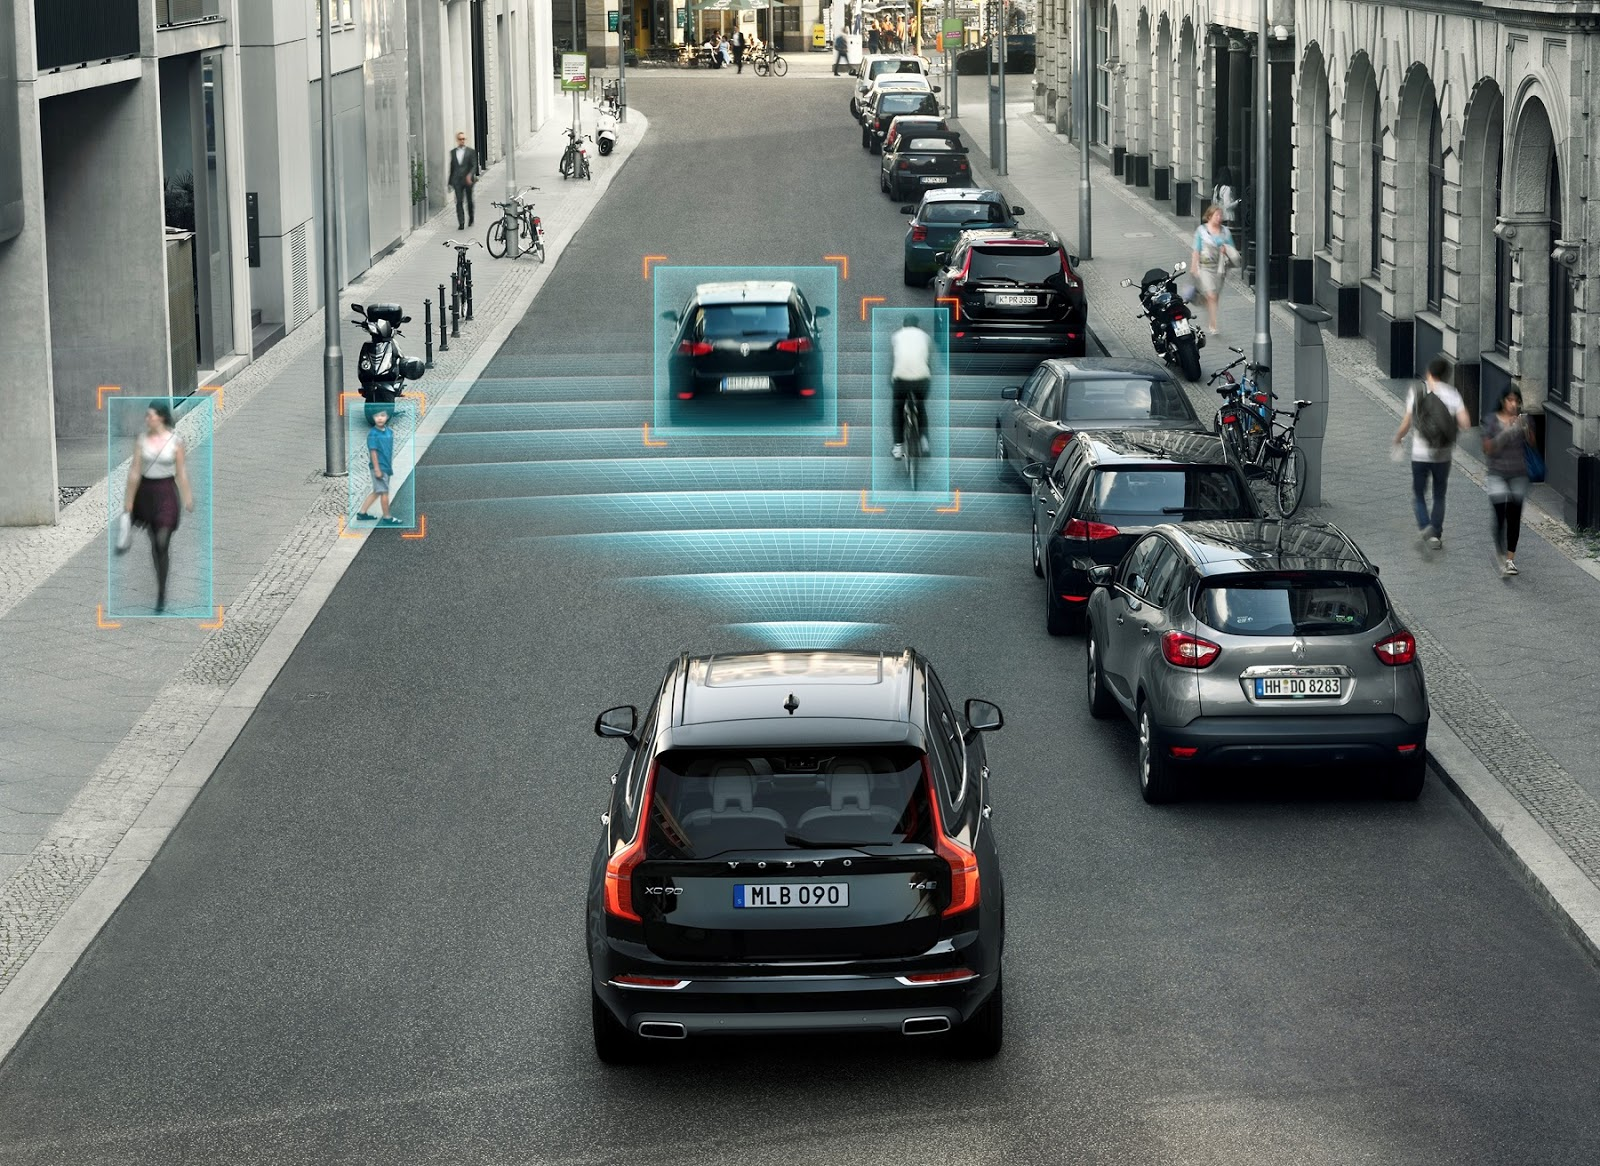 VOLVO XC90 CITY2BSAFETY Τα τρία ασφαλέστερα αυτοκίνητα κατά τον Euro NCAP είναι Volvo Euro NCAP, Safety, Volvo, ασφάλεια